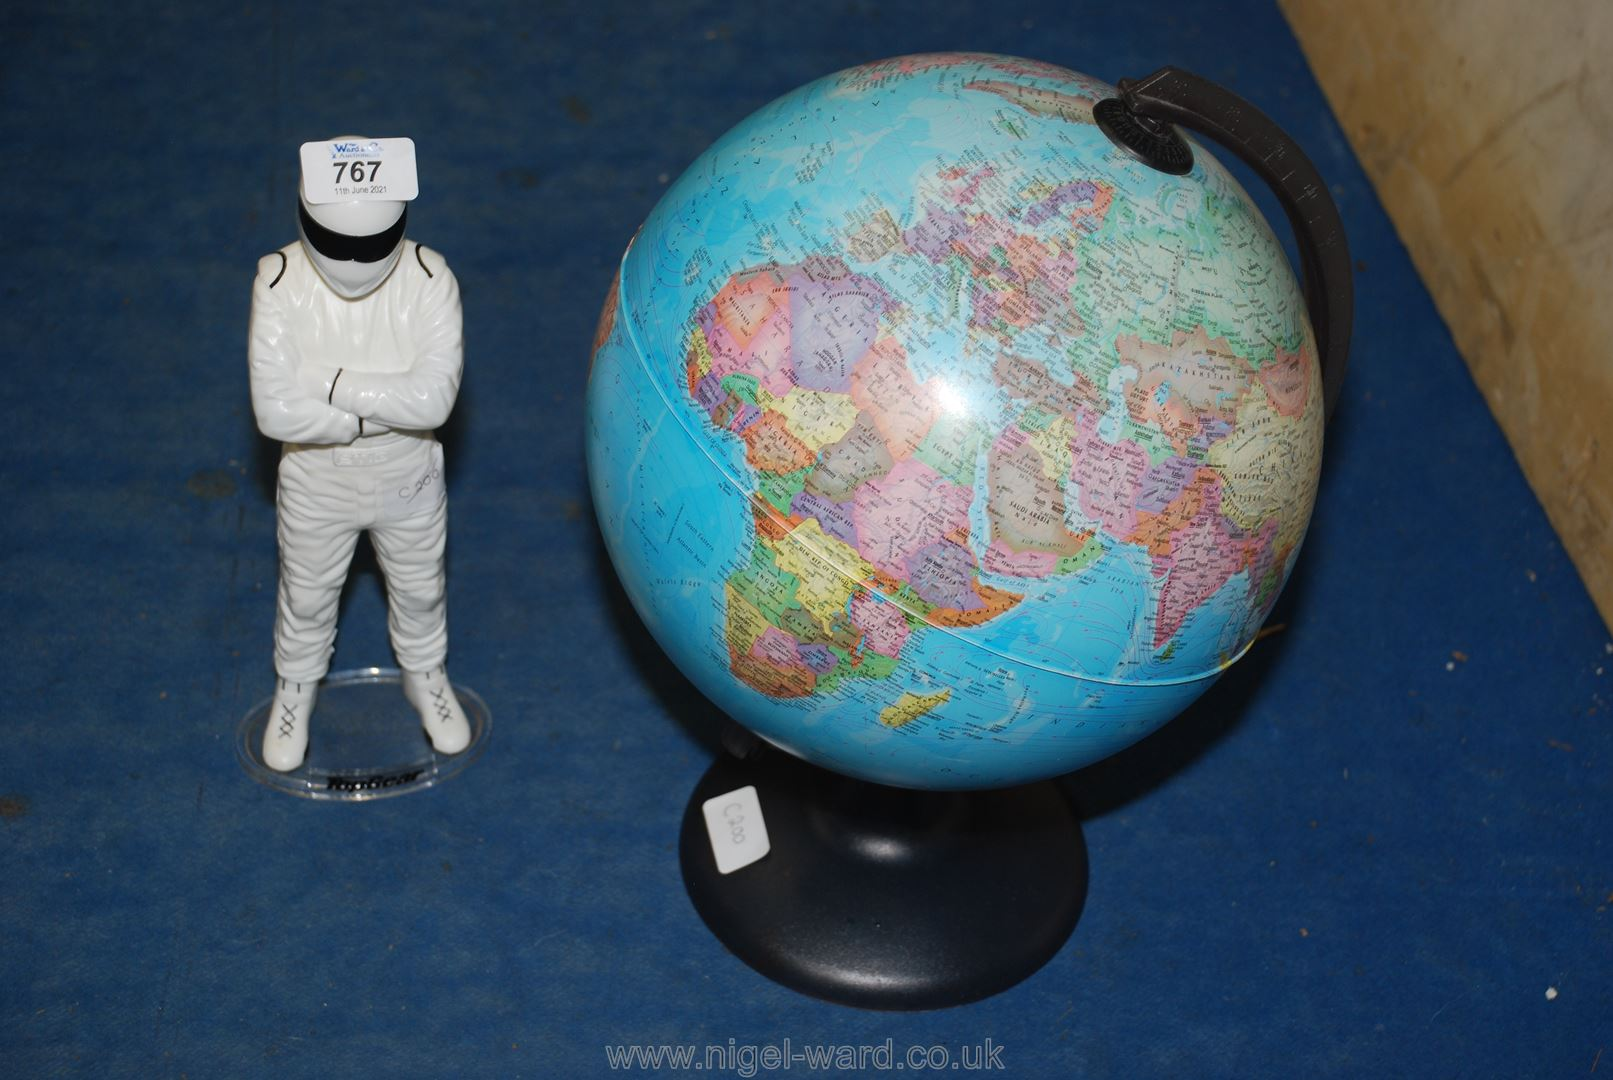 A small globe and a stig figure.